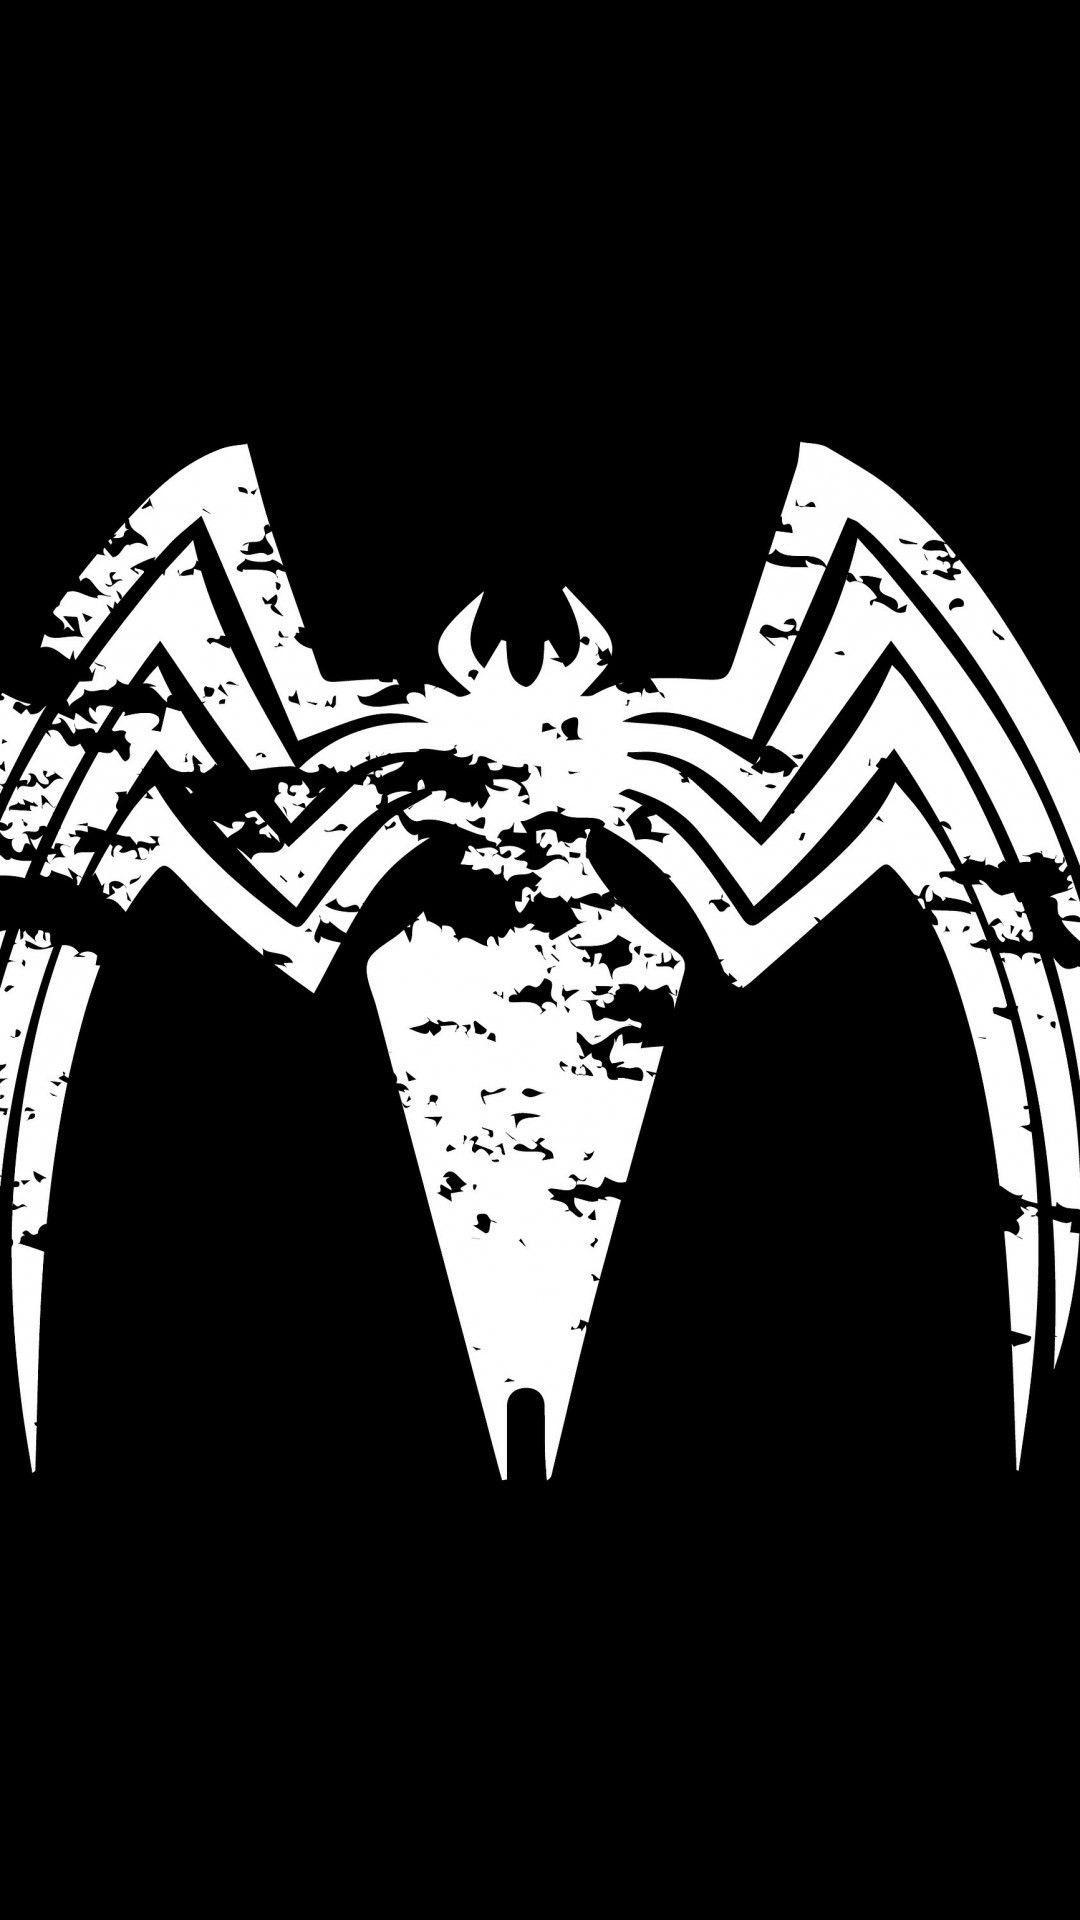 Venom Iphone Wallpapers Top Free Venom Iphone Backgrounds Wallpaperaccess